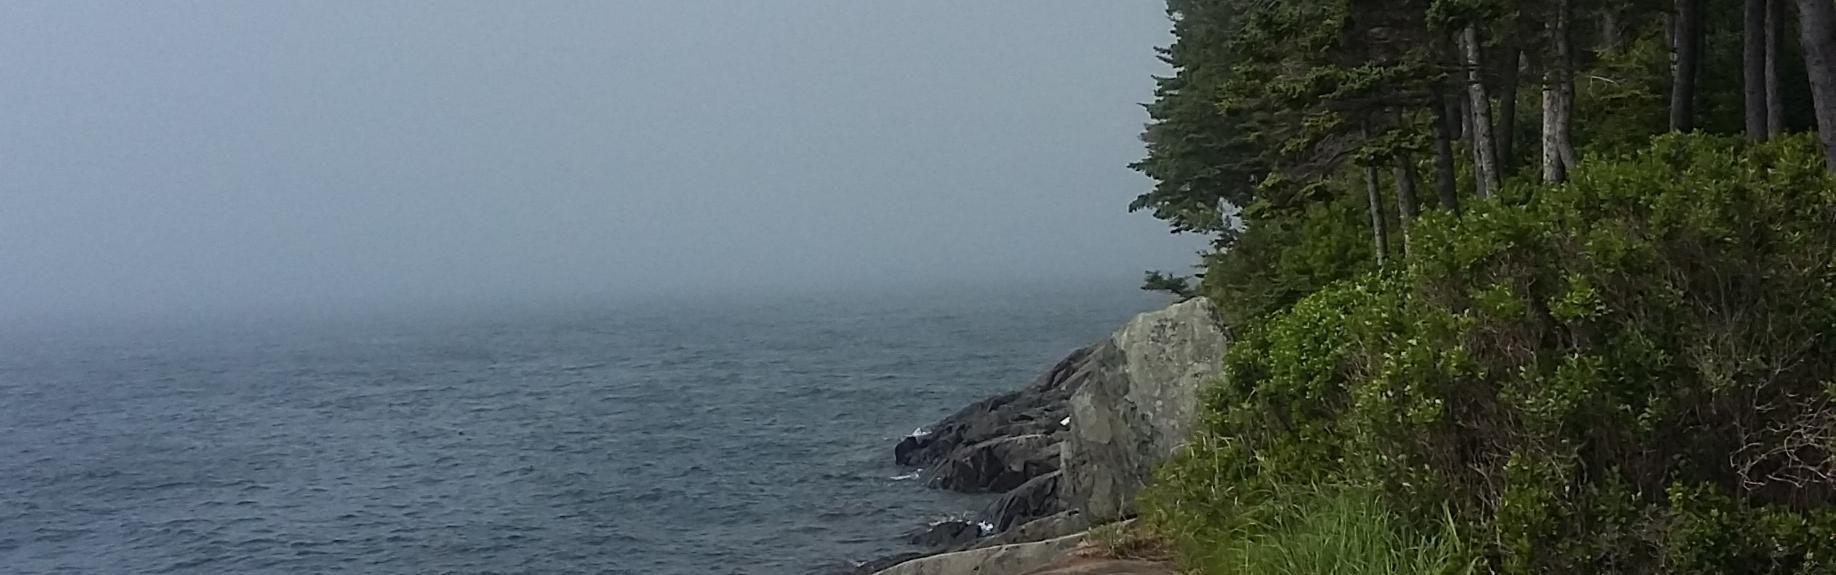 Owls Head Lighthouse, Maine, United States of America